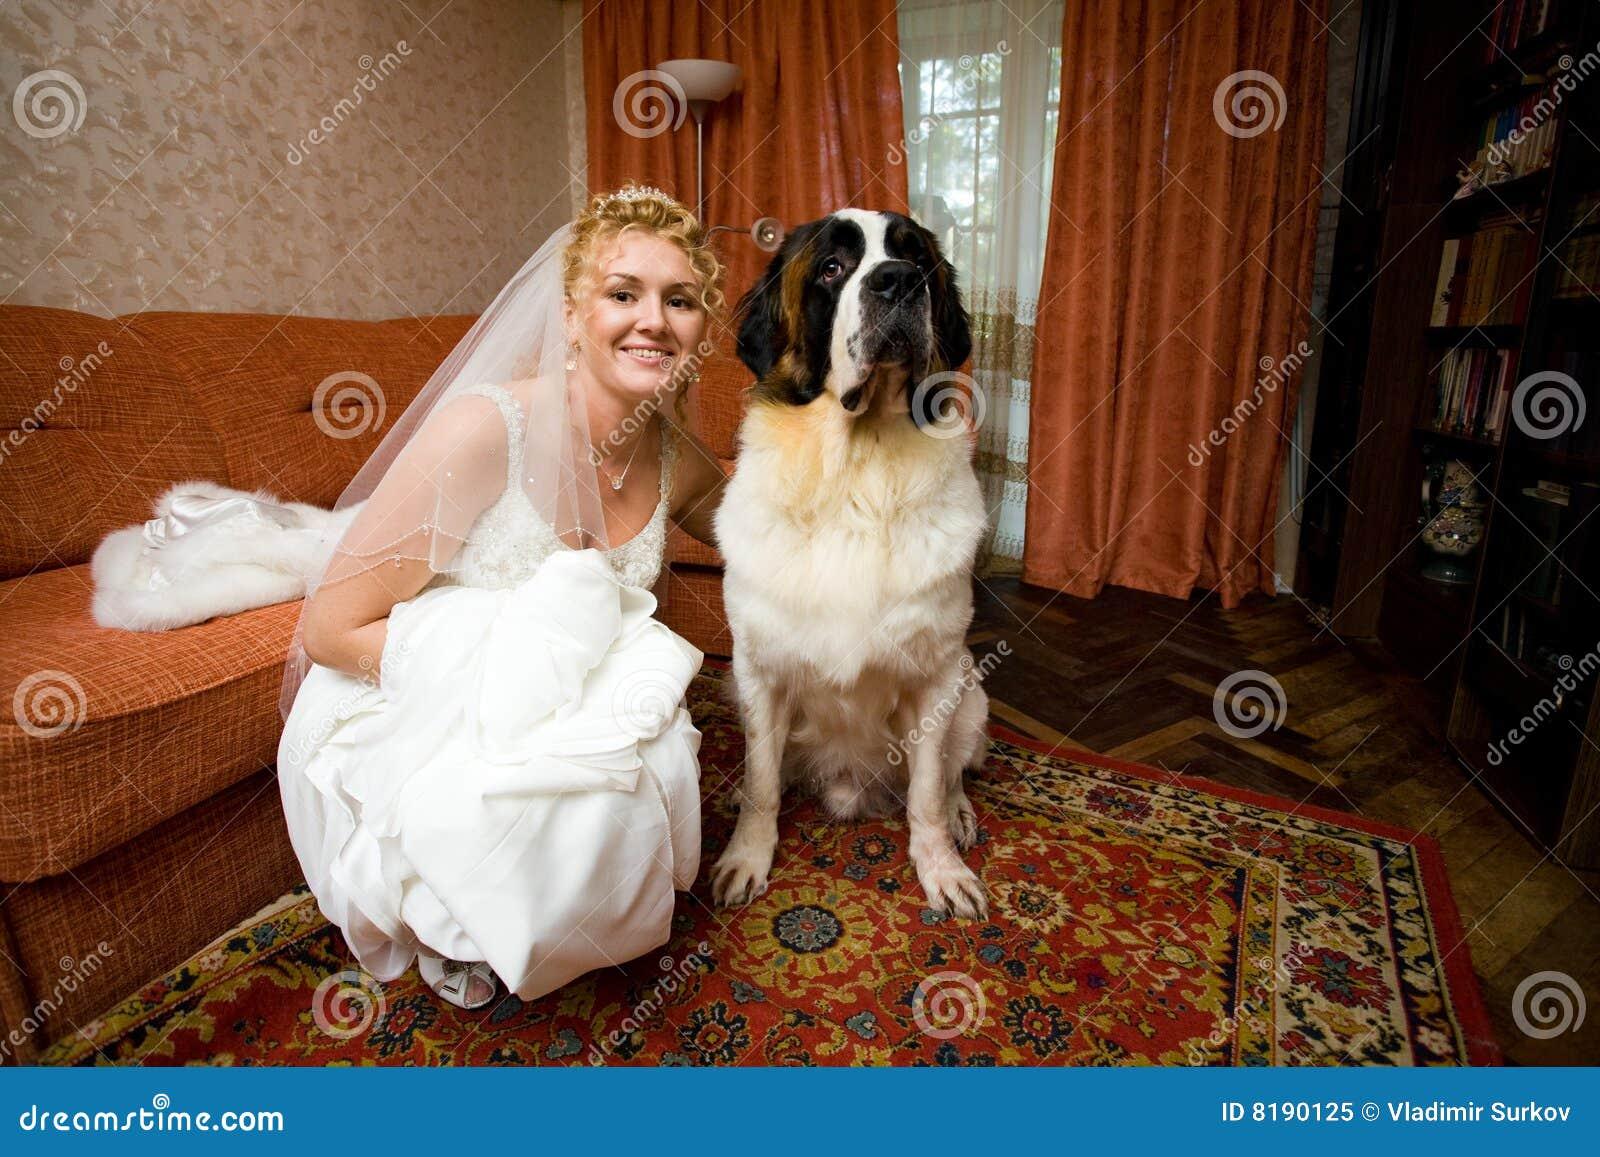 Bride And Dog Royalty Free Stock Photo Image 8190125